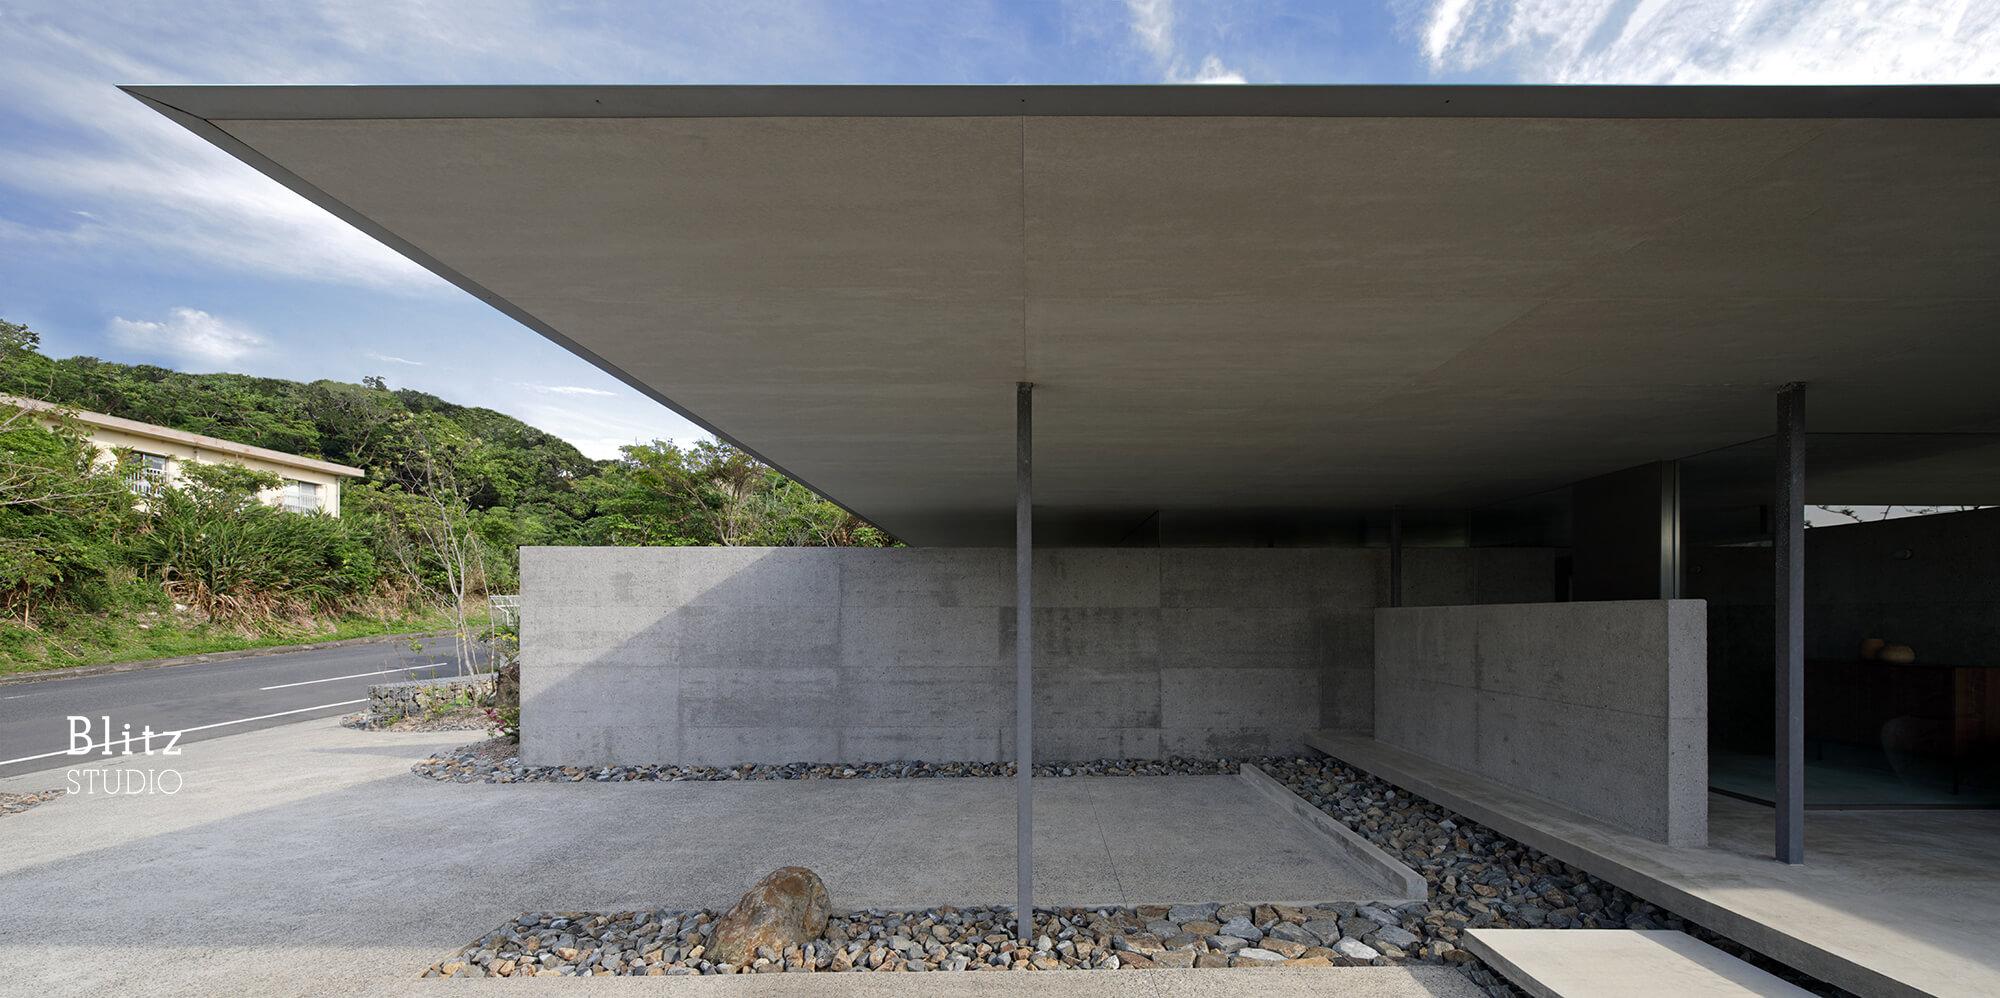 『父母の家』-鹿児島県奄美大島-建築写真・竣工写真・インテリア写真4